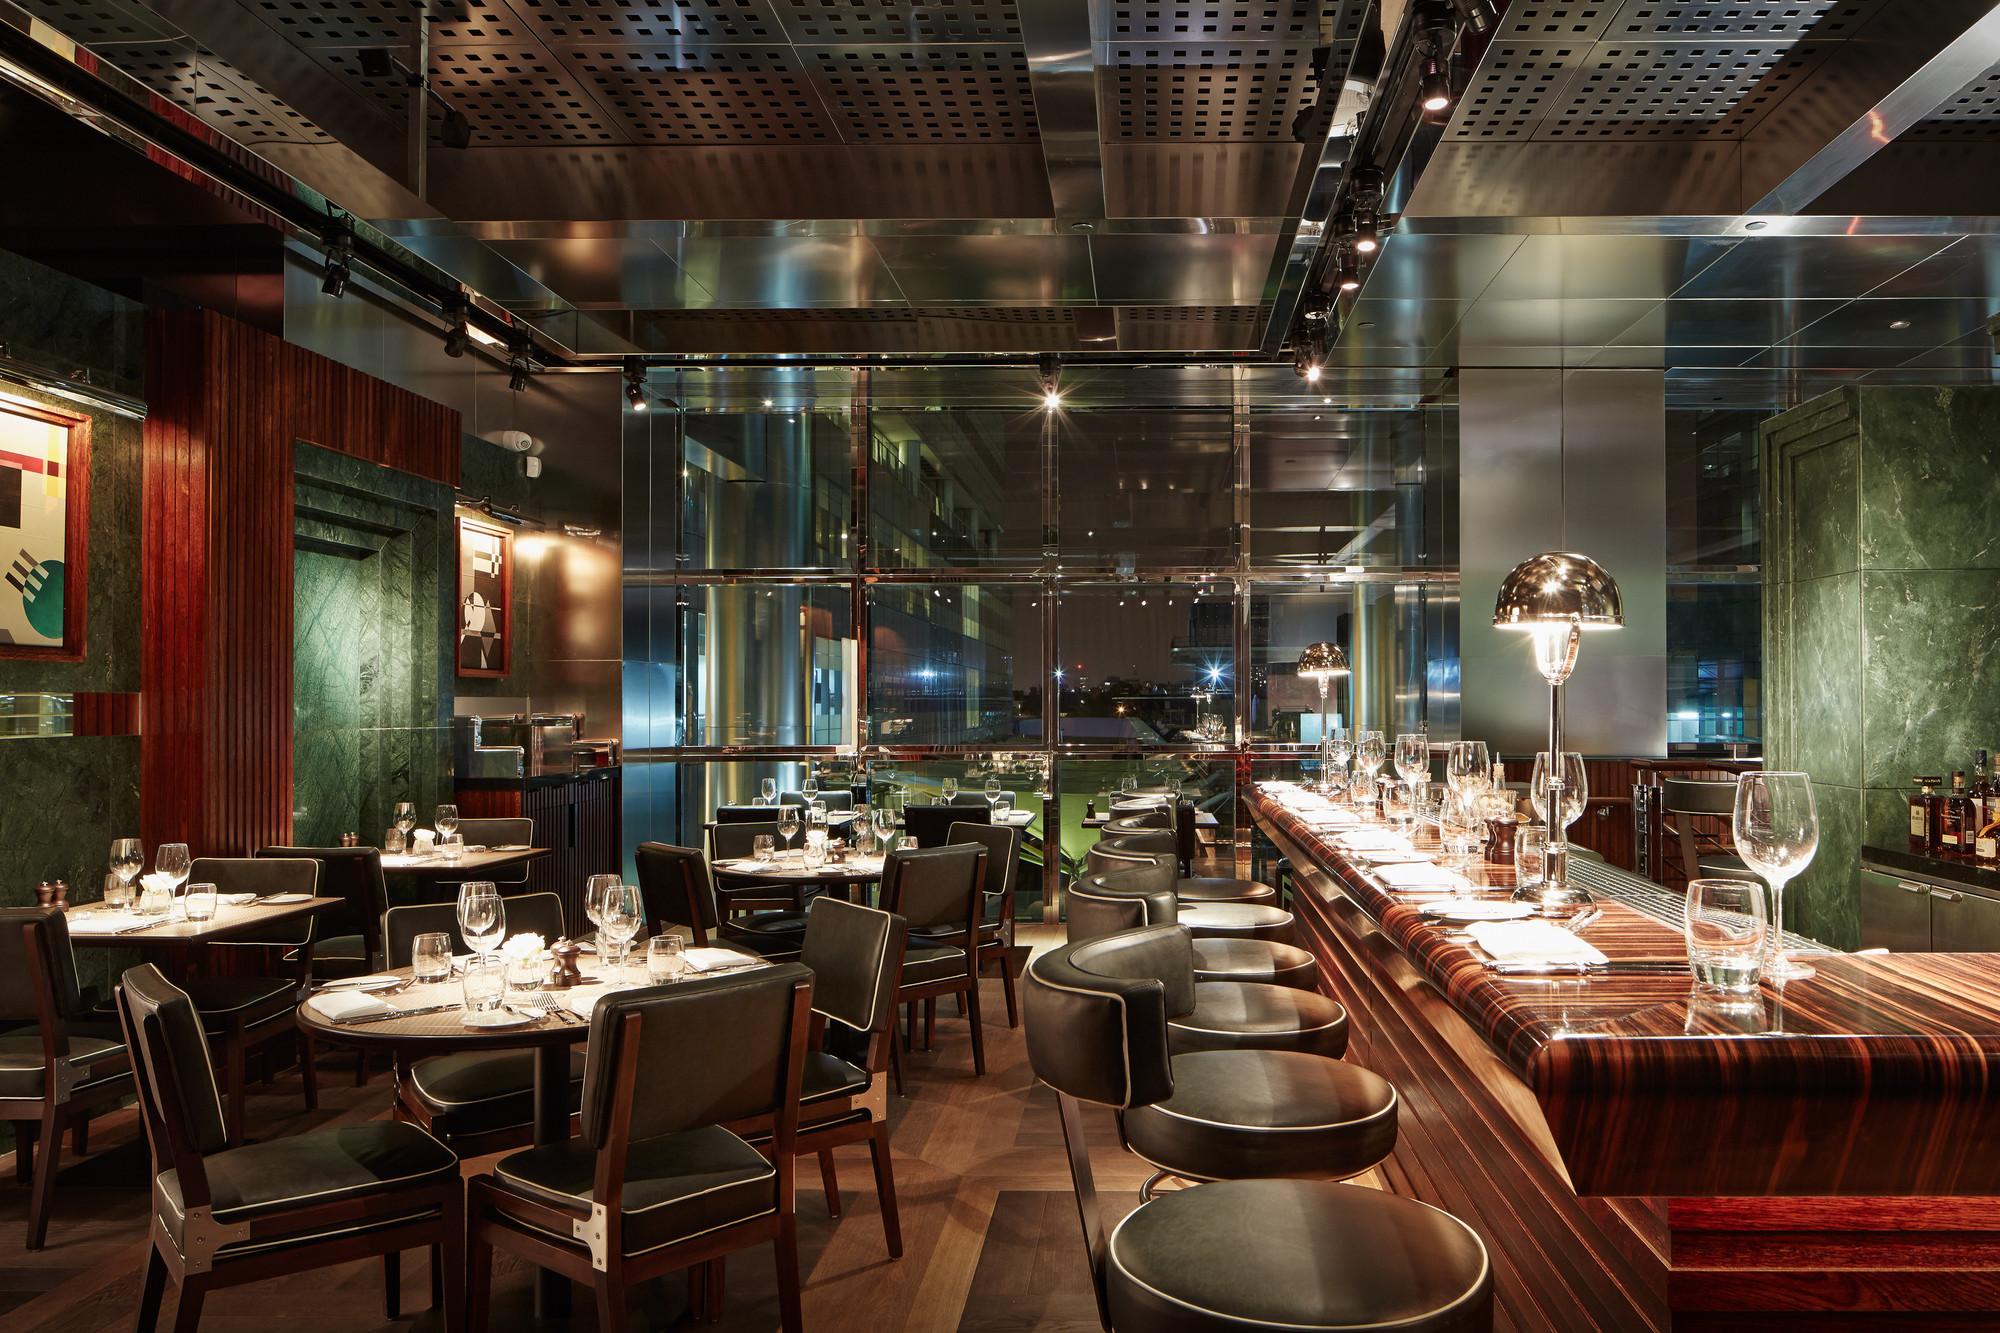 Gallery of 2014 Restaurant  Bar Design Award Winners  16